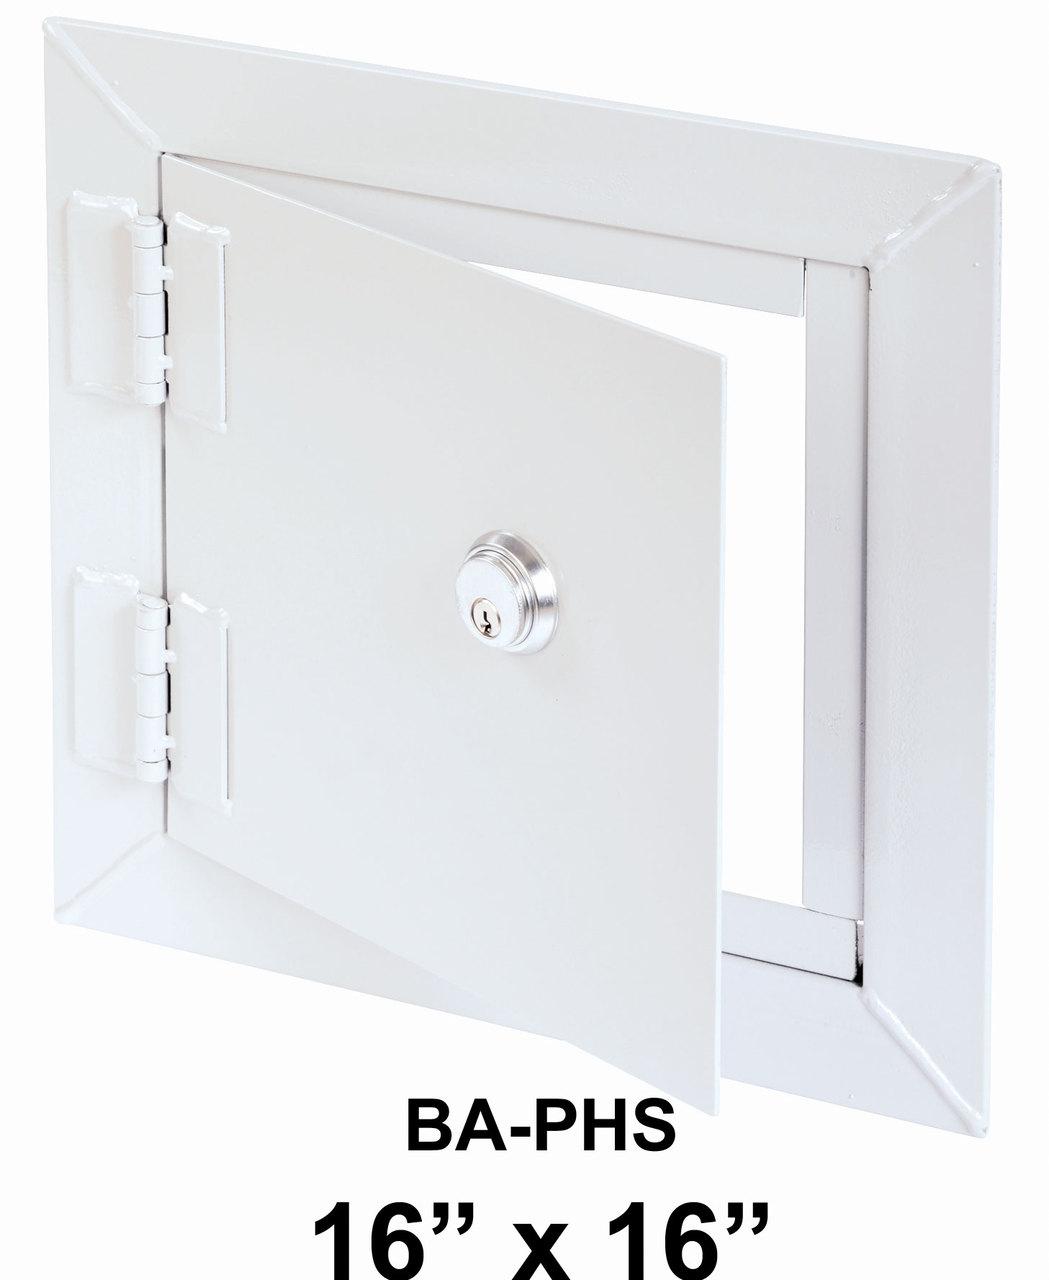 Access Panels BA-PHS 16 x 16 High Security Access - BEST